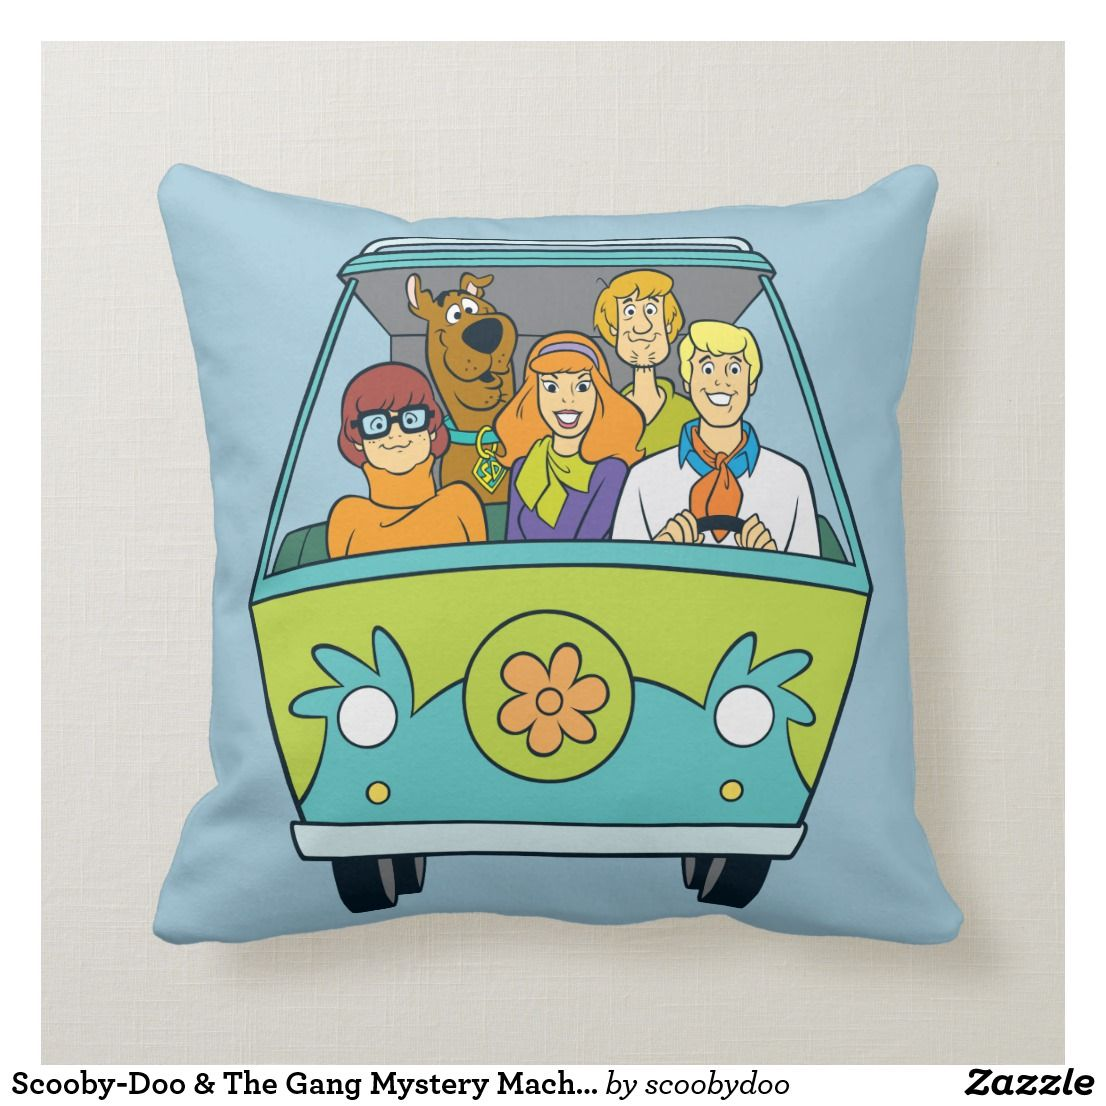 The Great Dane Pillow Scooby Doo Kids Scooby Doo Scooby Doo Movie